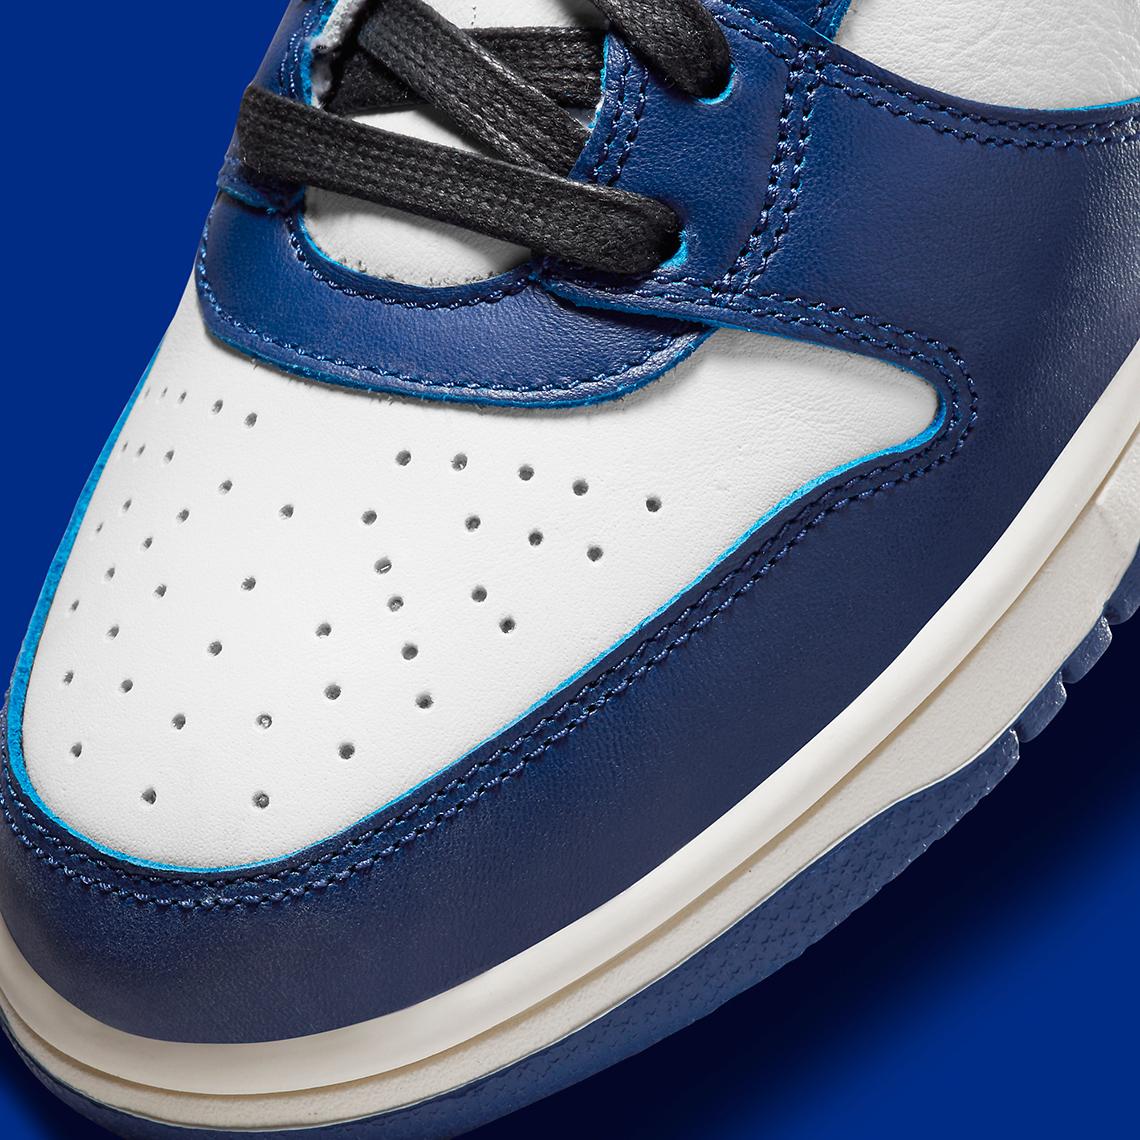 AMBUSH x Nike Dunk High ''Deep Royal Blue'' - CU7544-400